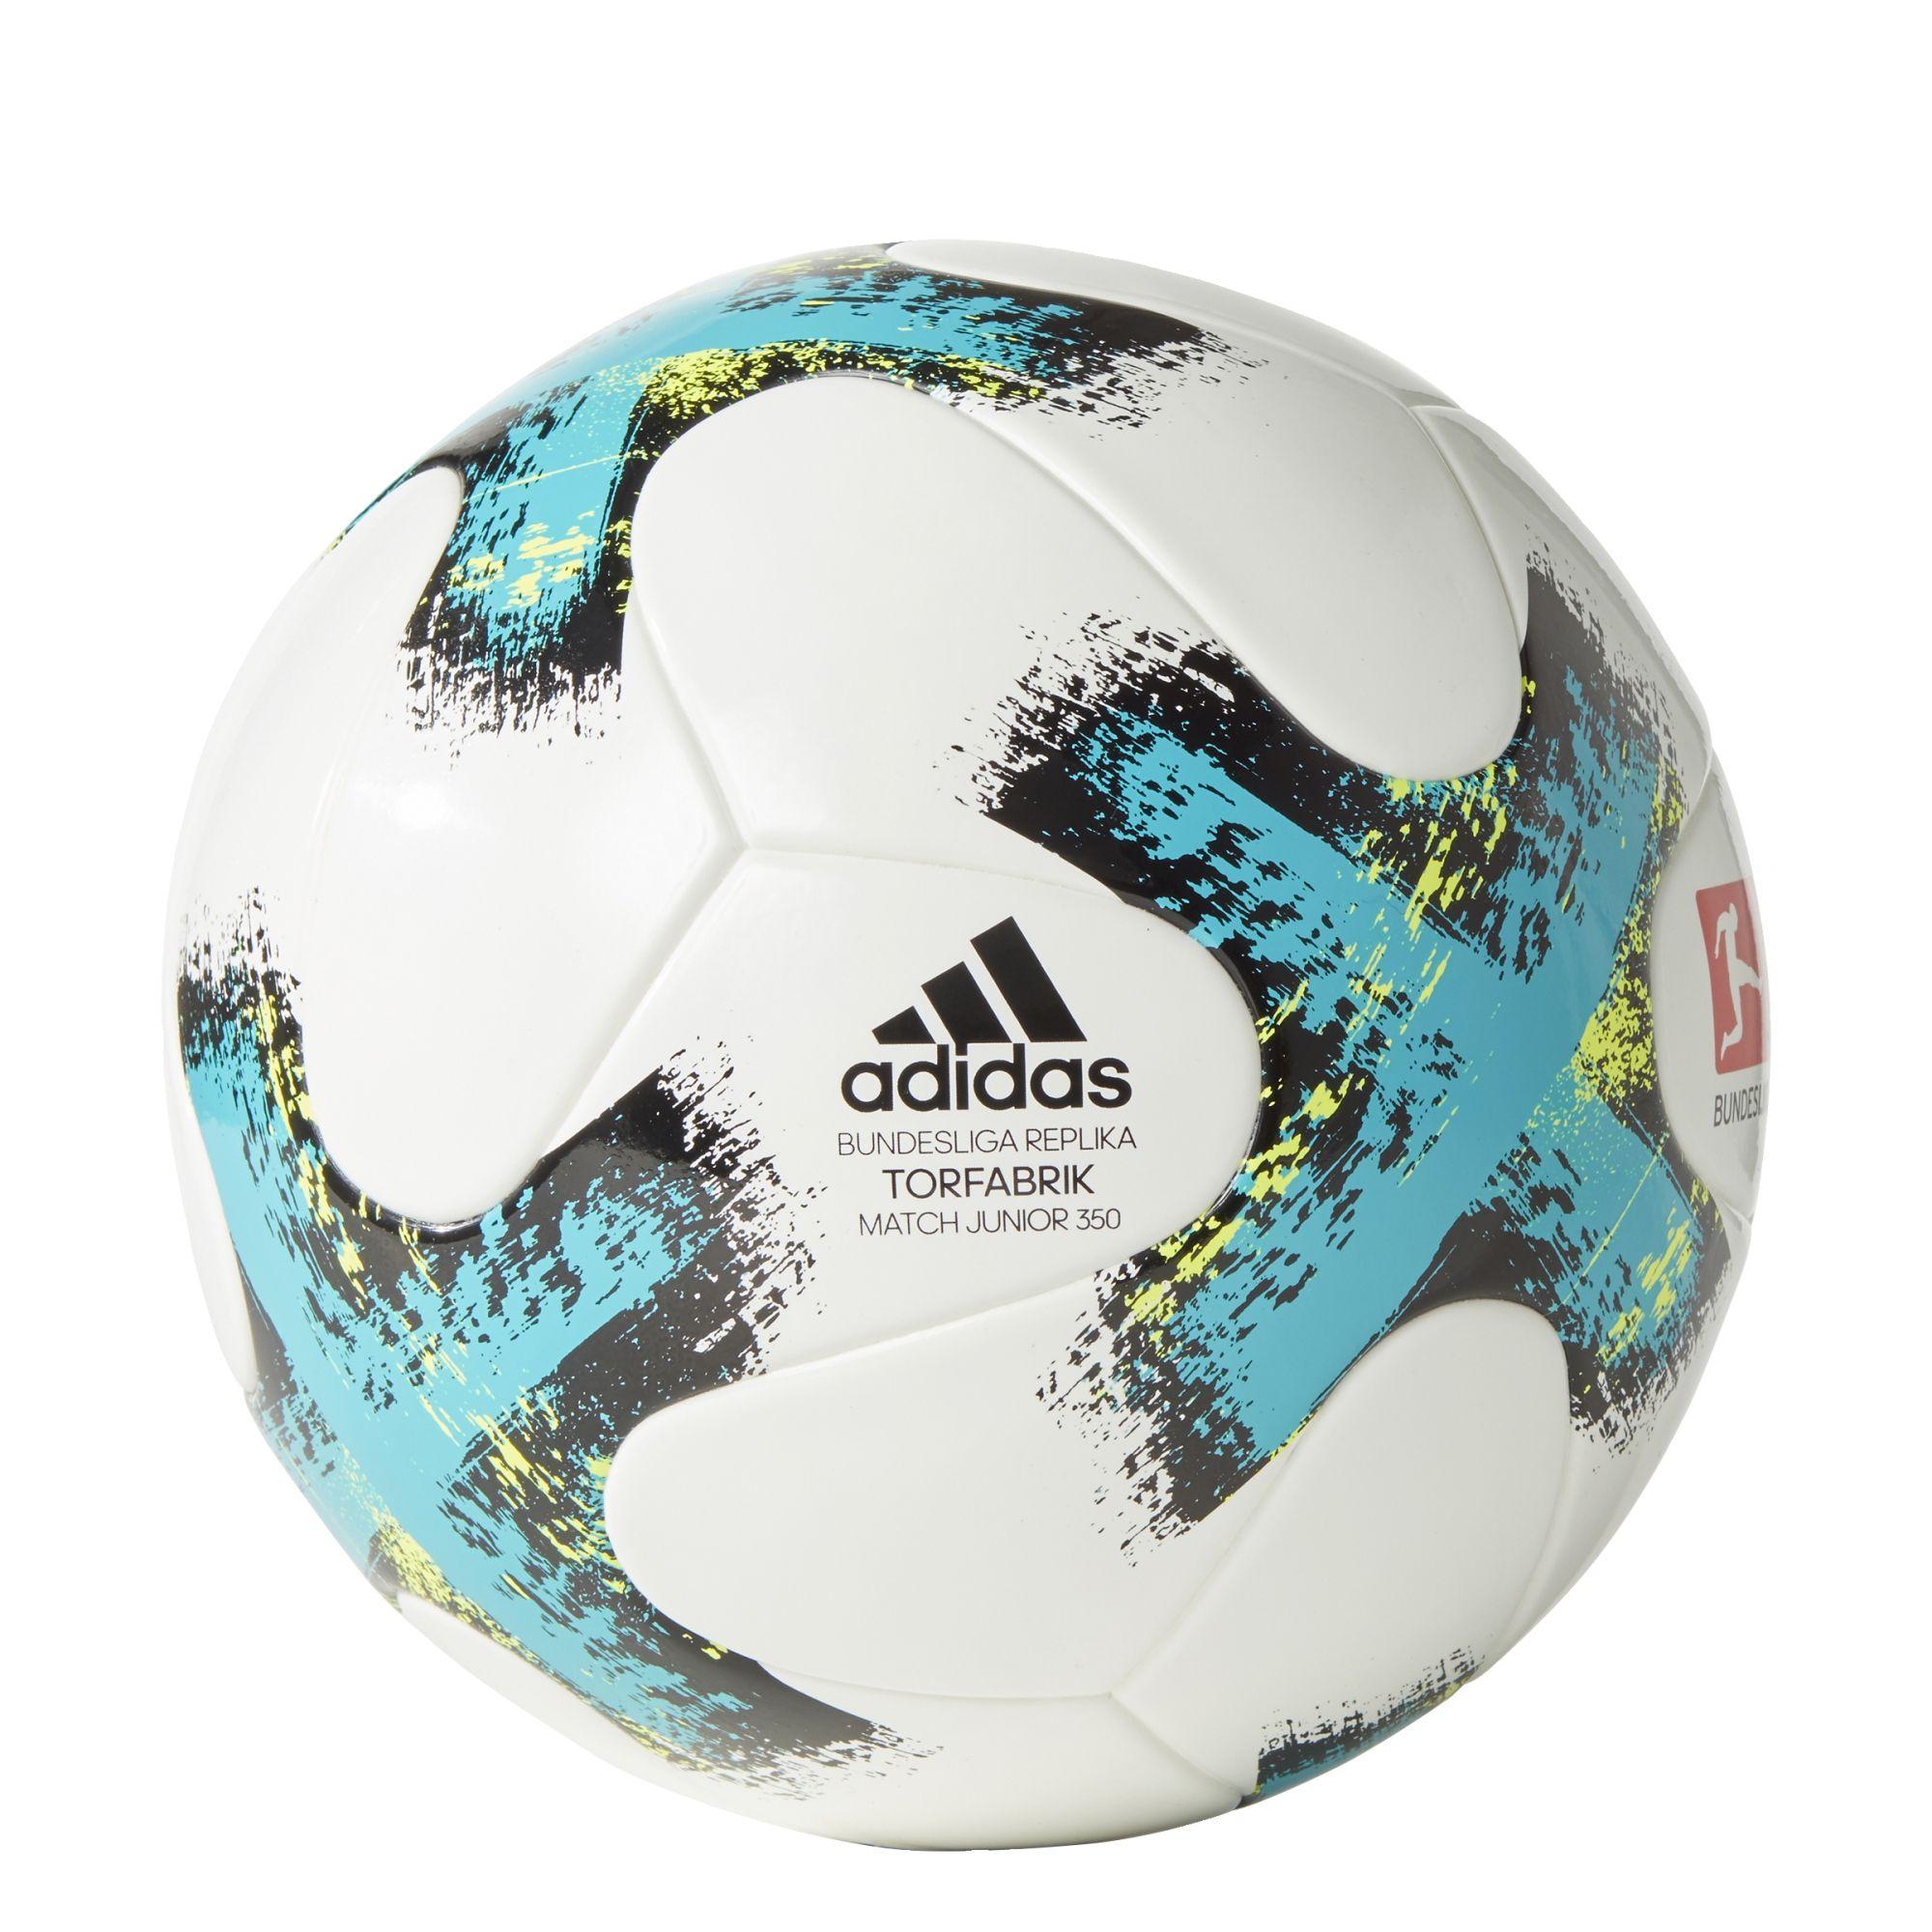 ADIDAS PERFORMANCE adidas Performance Fußball »Torfabrik Junior 350 17/18«